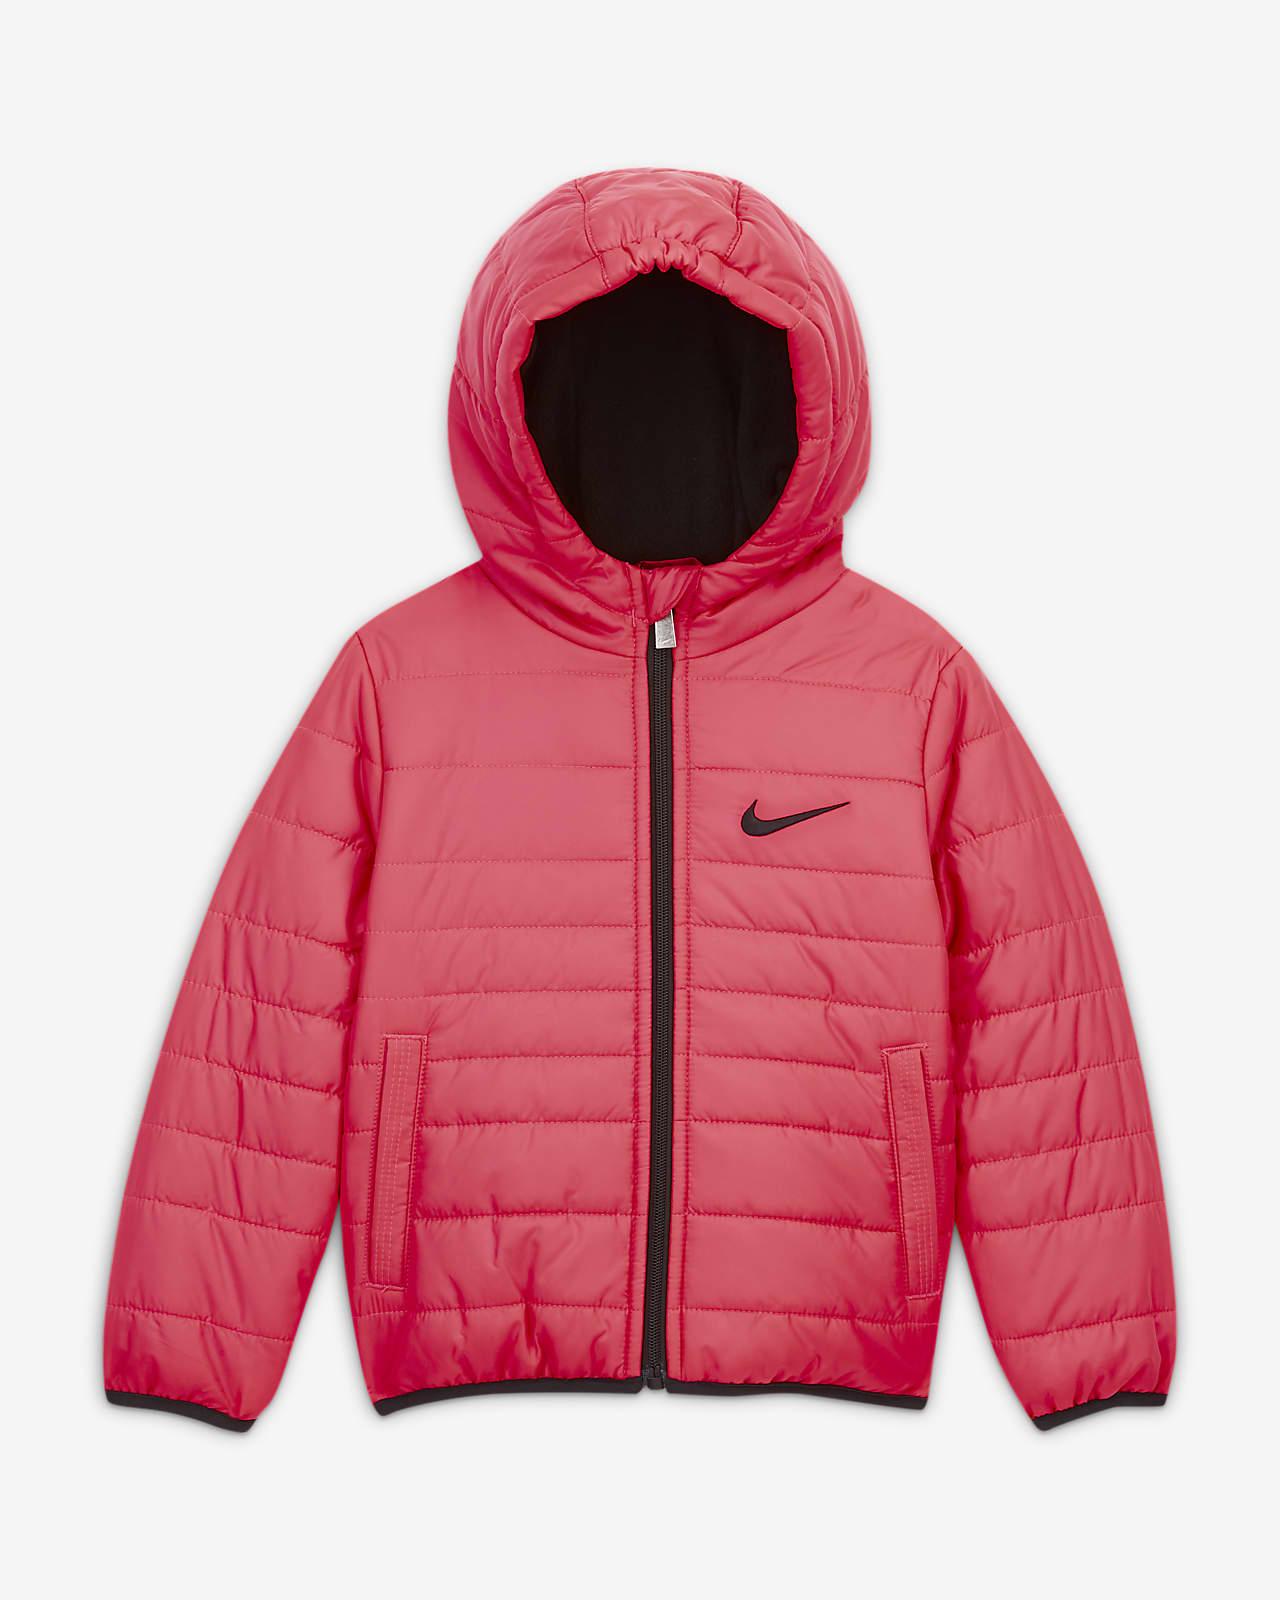 Giacca piumino Nike - Bimbi piccoli